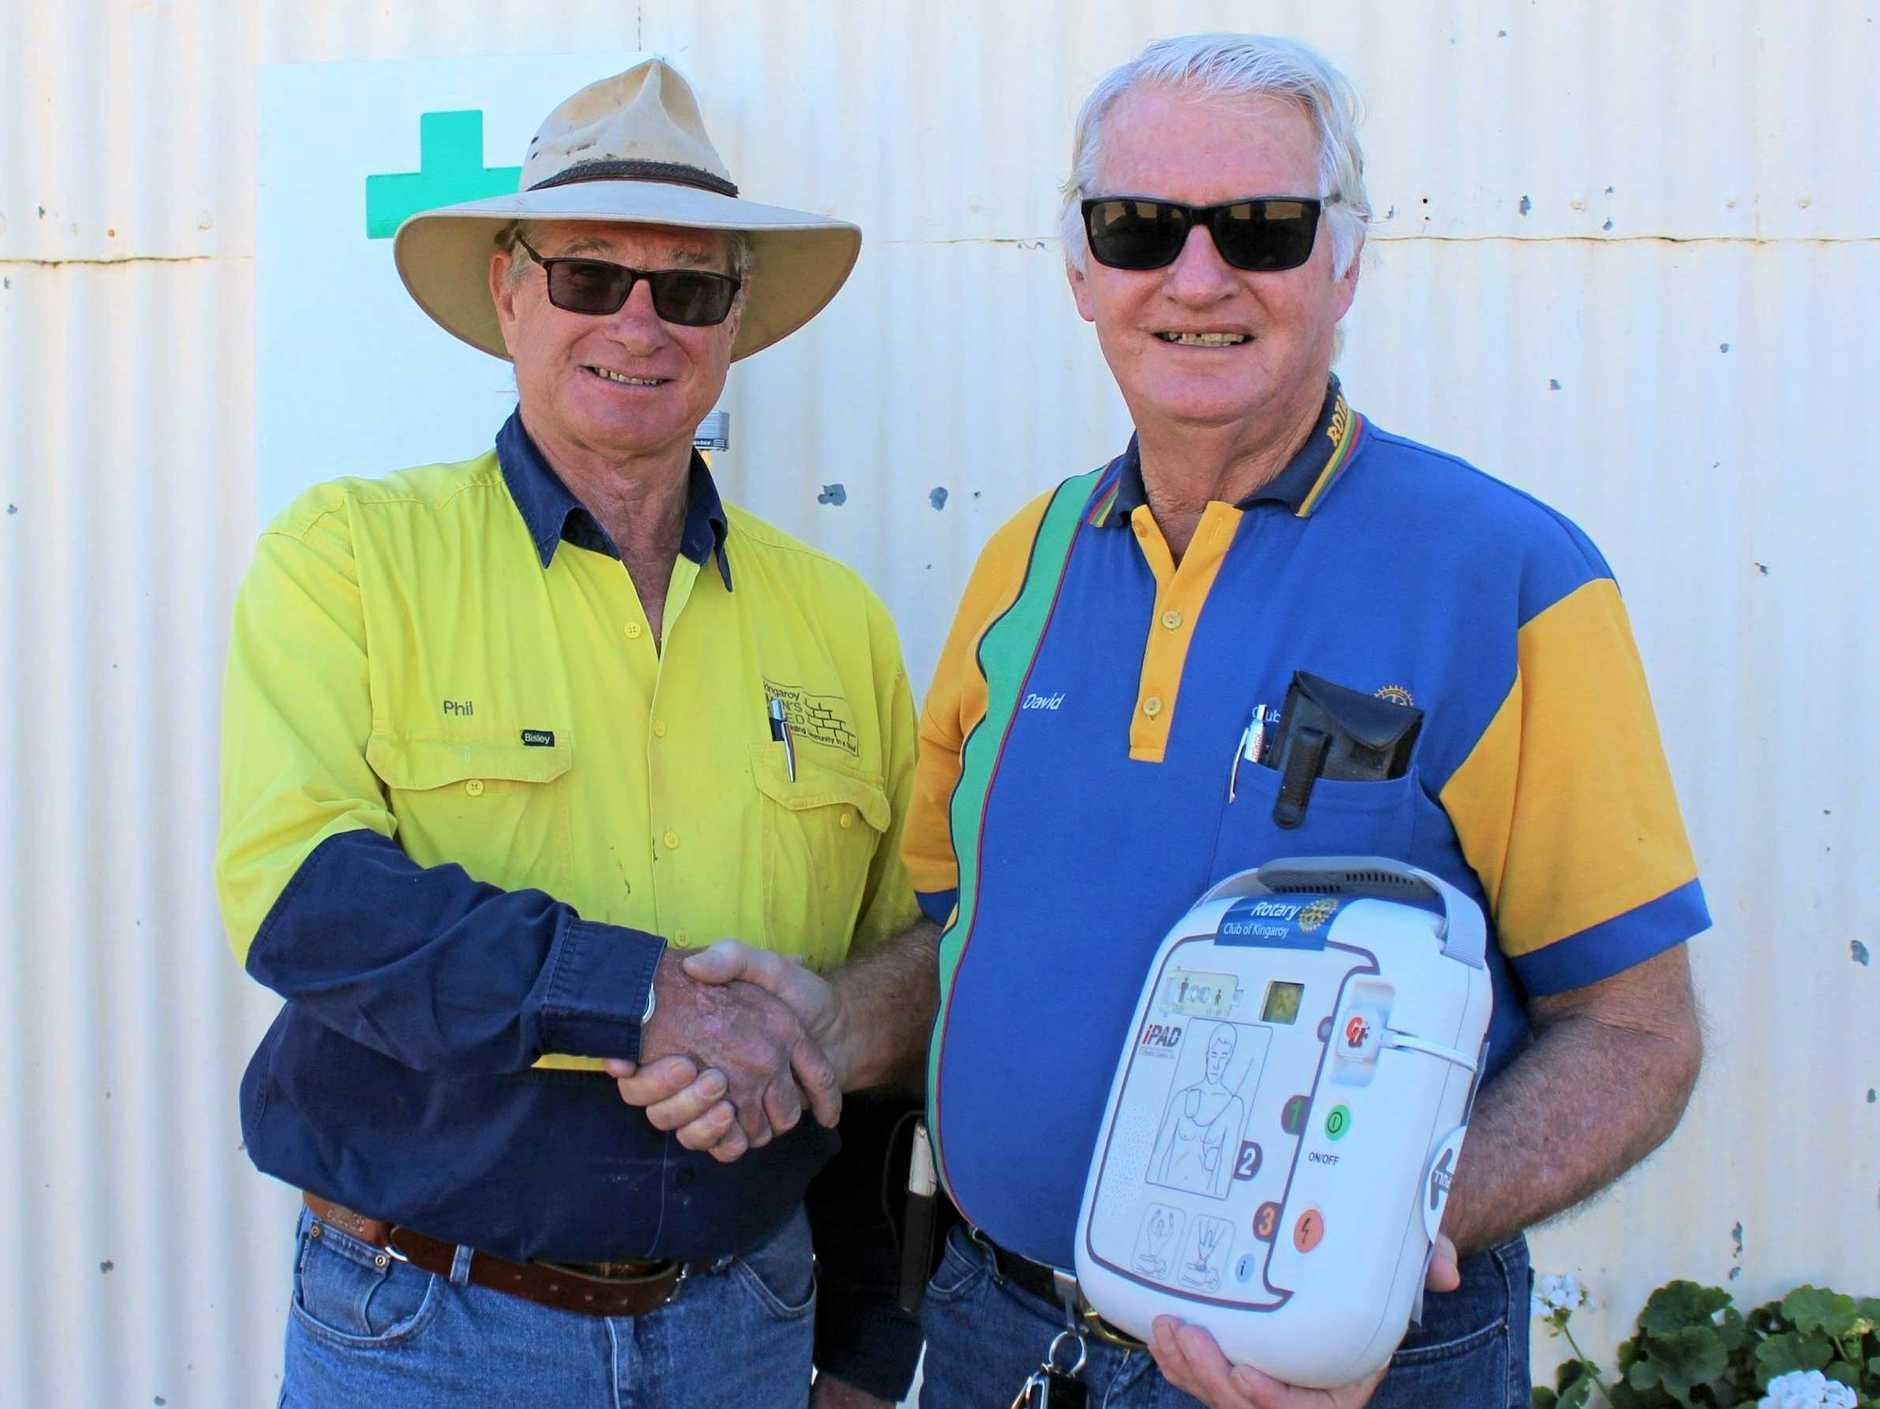 HANDOVER: Kingaroy Men's Shed president Phil Day receives the defibrillator from Kingaroy Rotary Club president David Black.